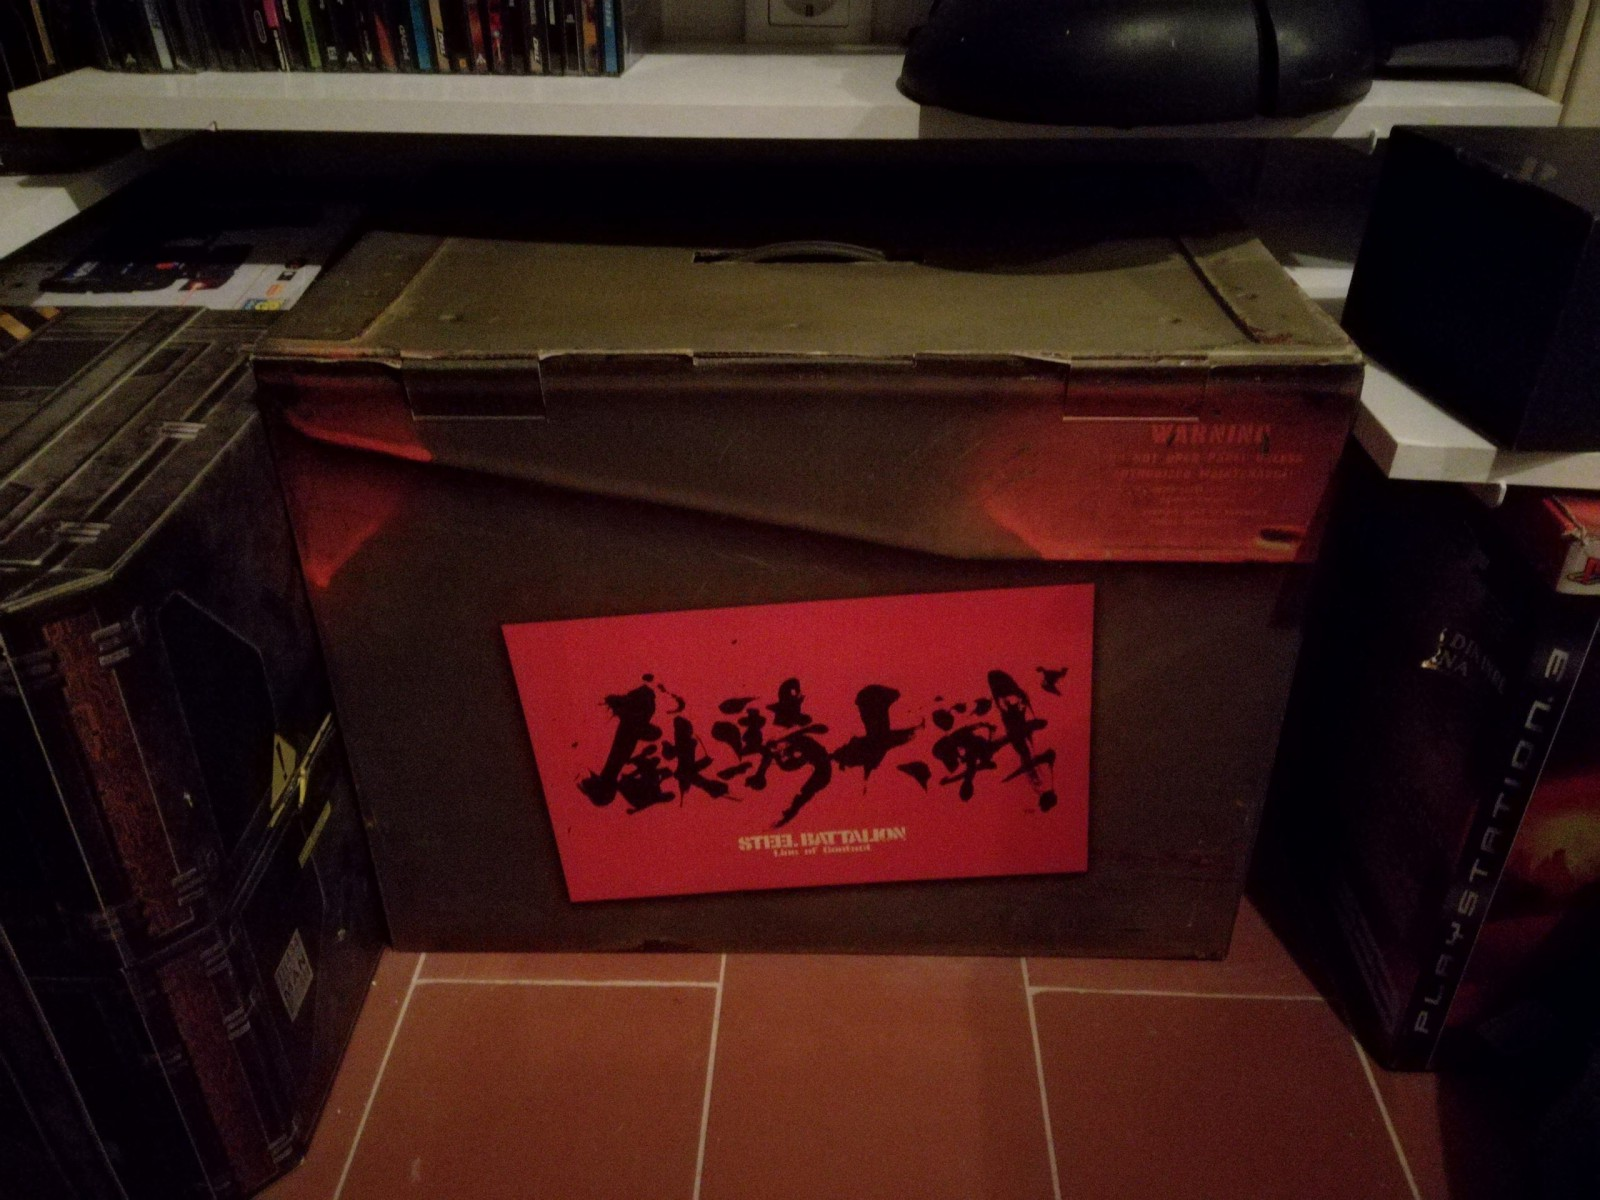 Steel Battalion Box